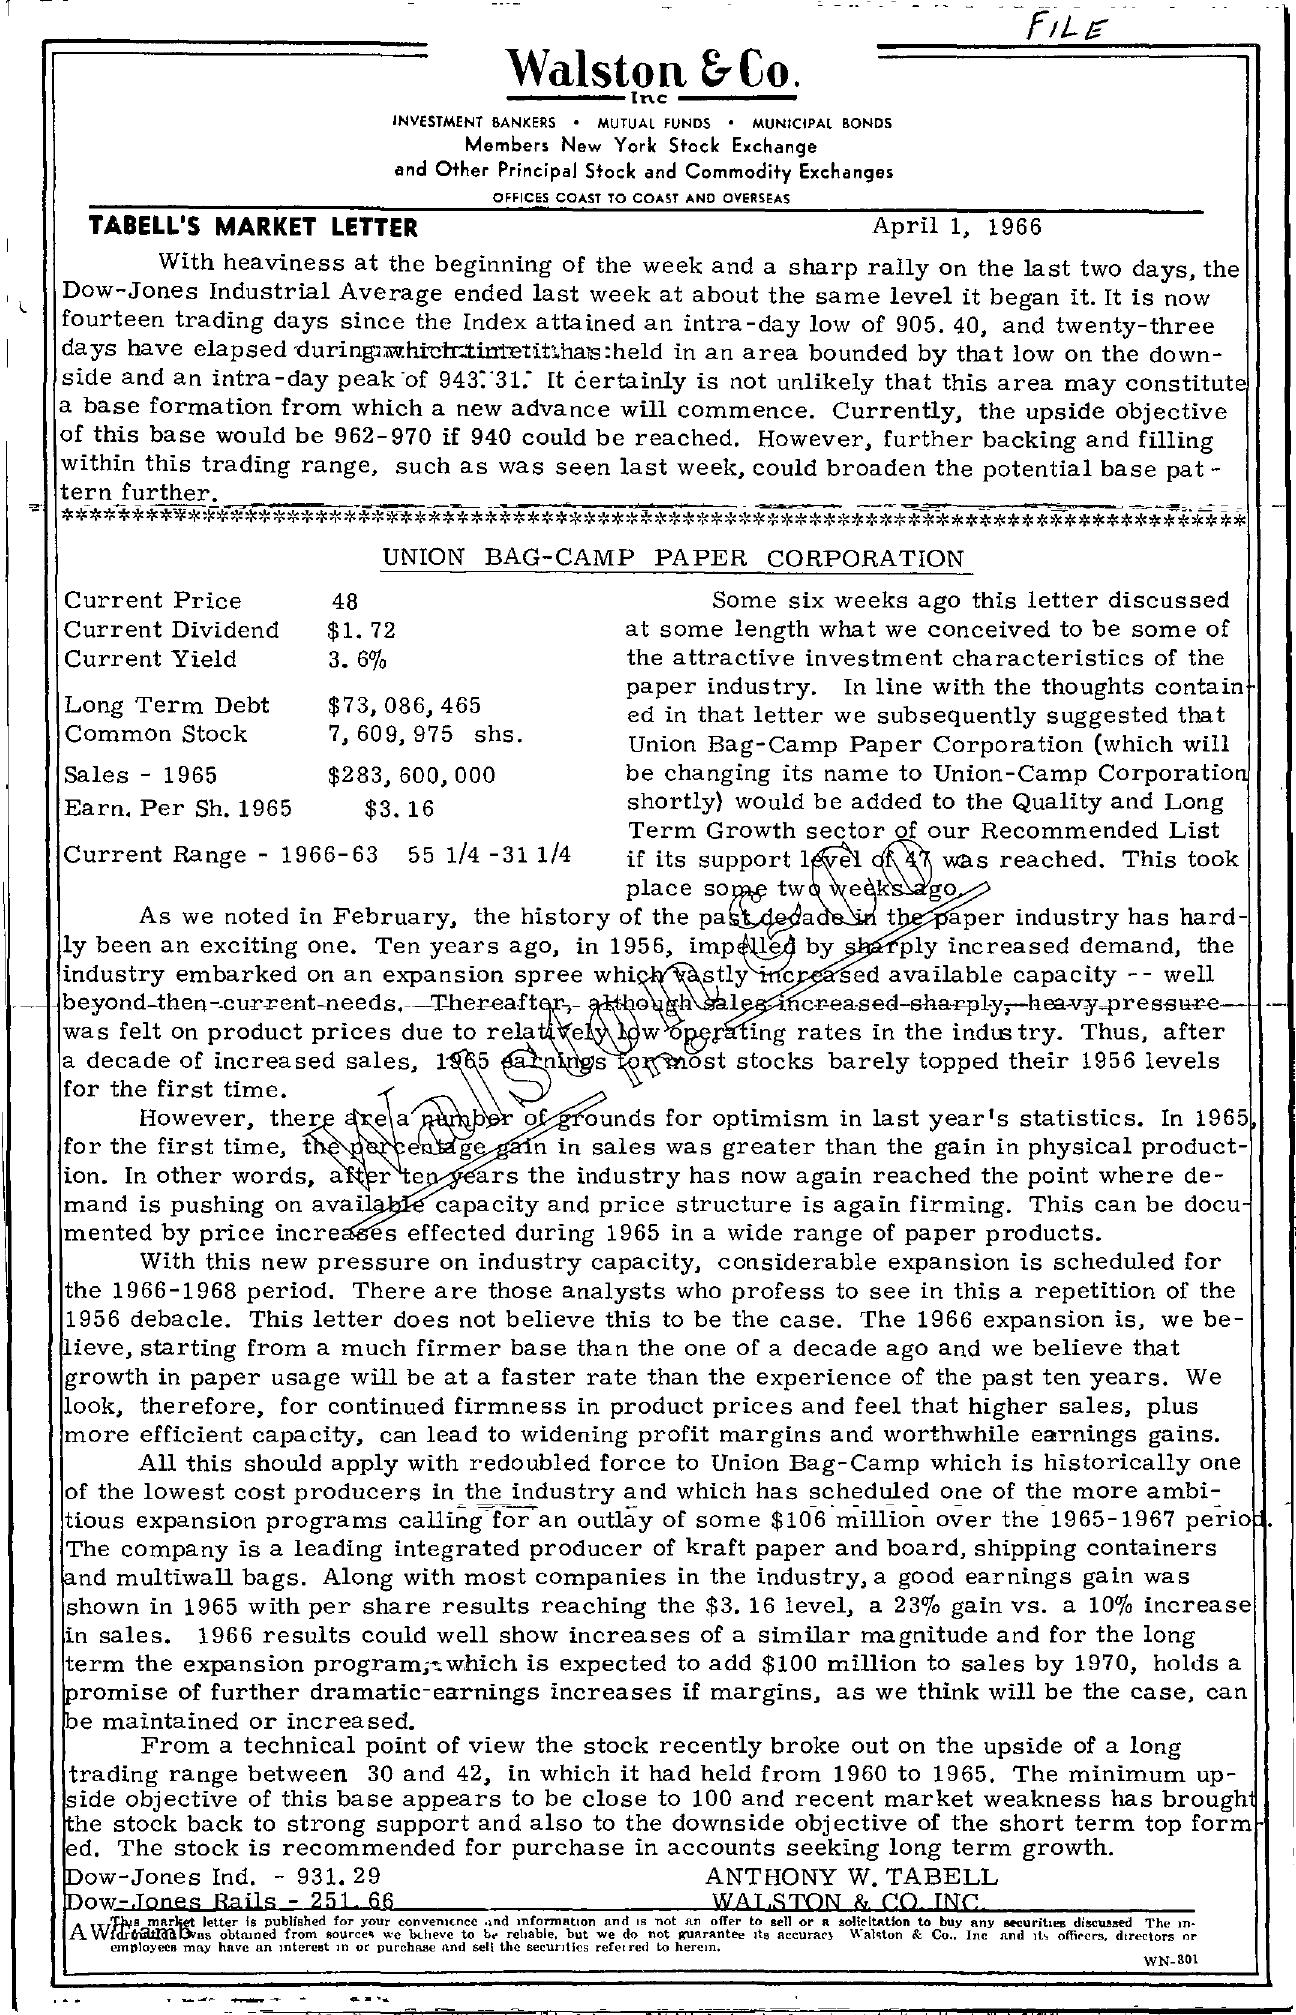 Tabell's Market Letter - April 01, 1966